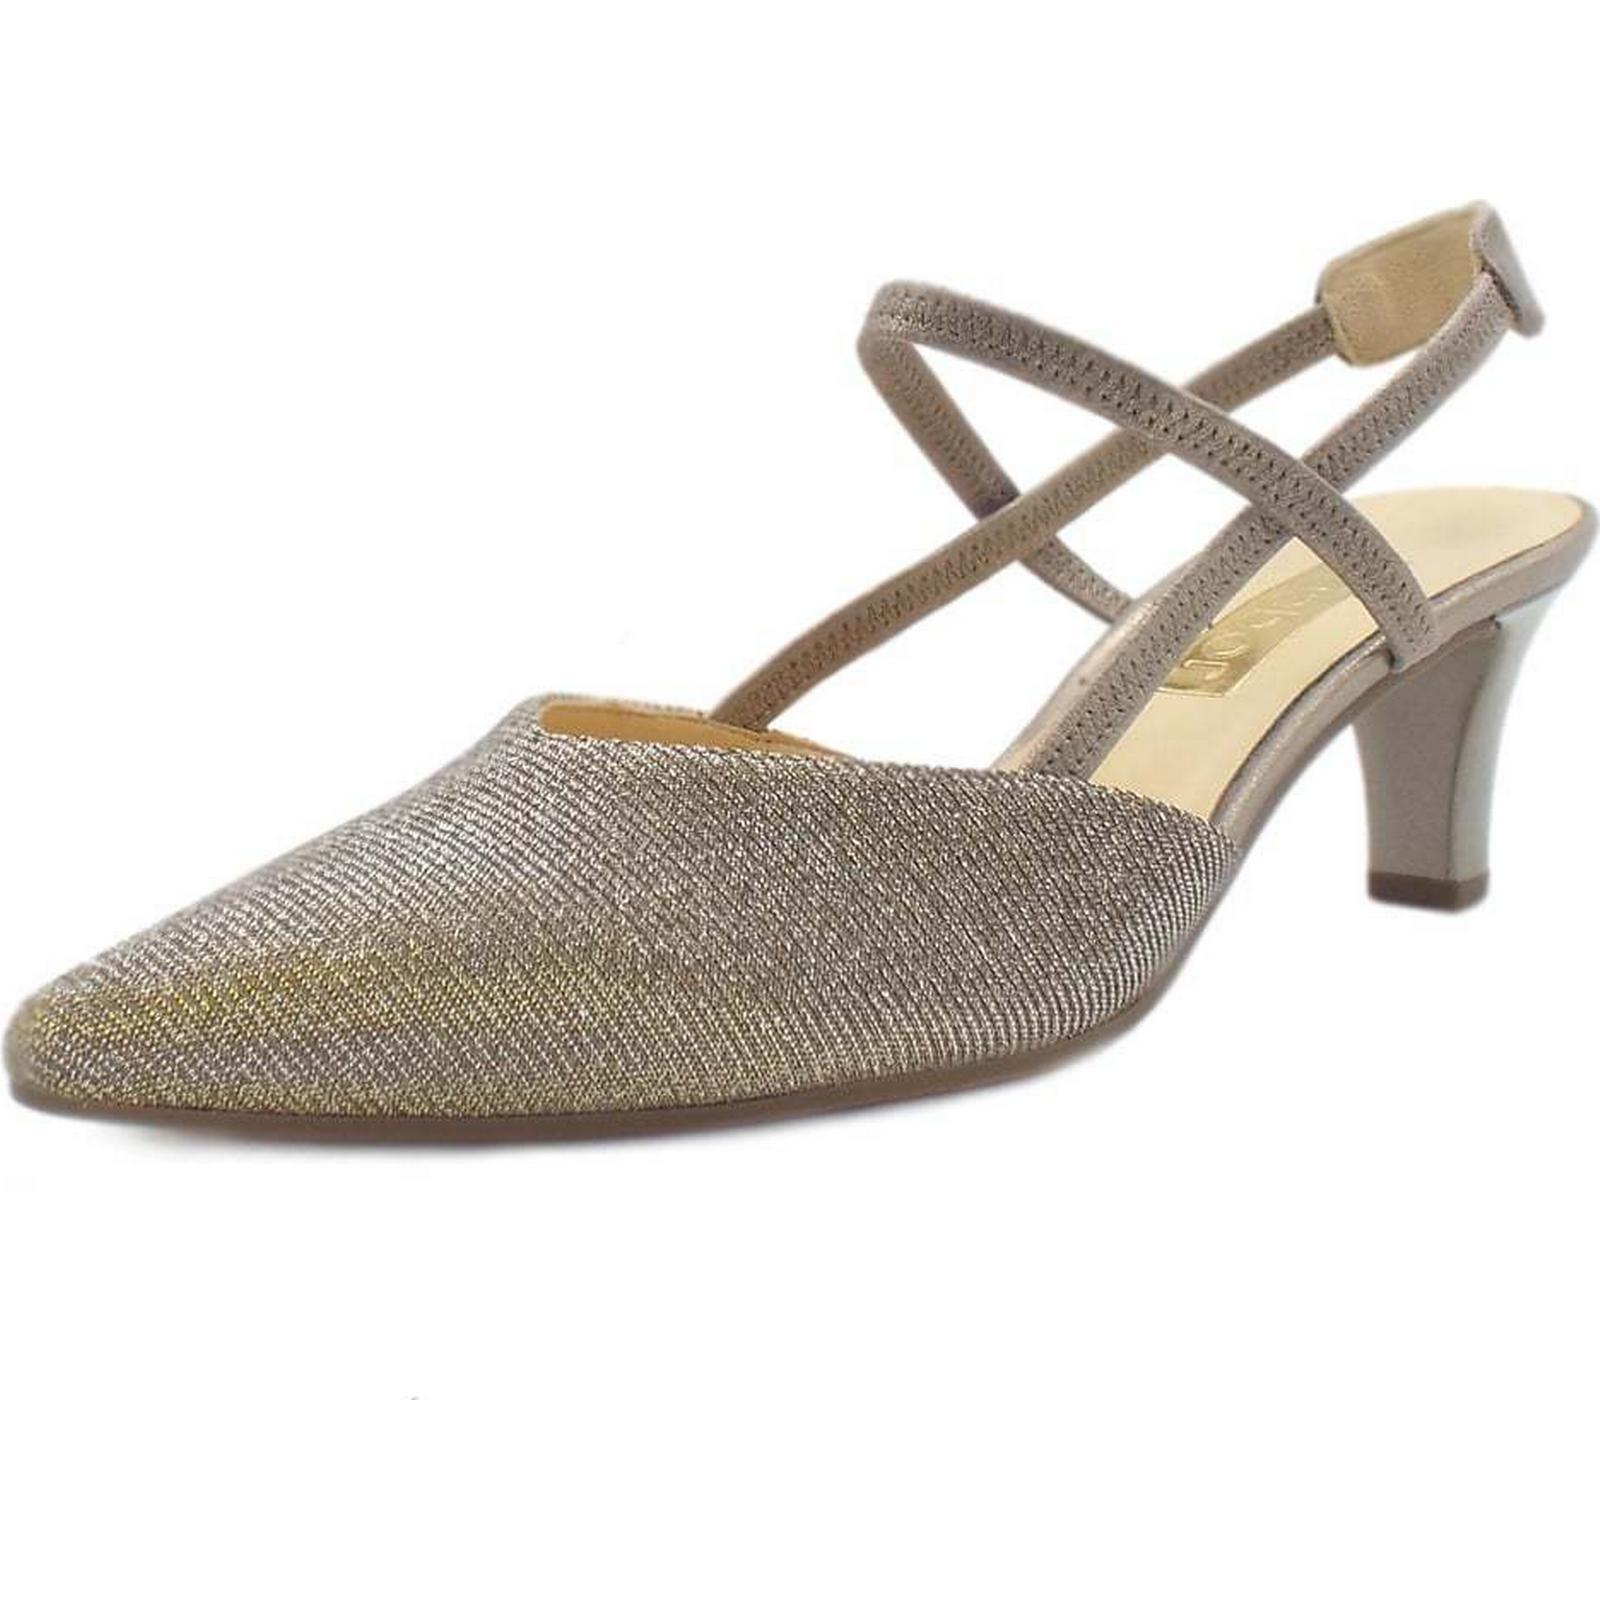 Gabor CASTELLO Size: GABOR LADIES SANDALS Colour: SILVER/GOLD, Size: CASTELLO 3.5 64a731